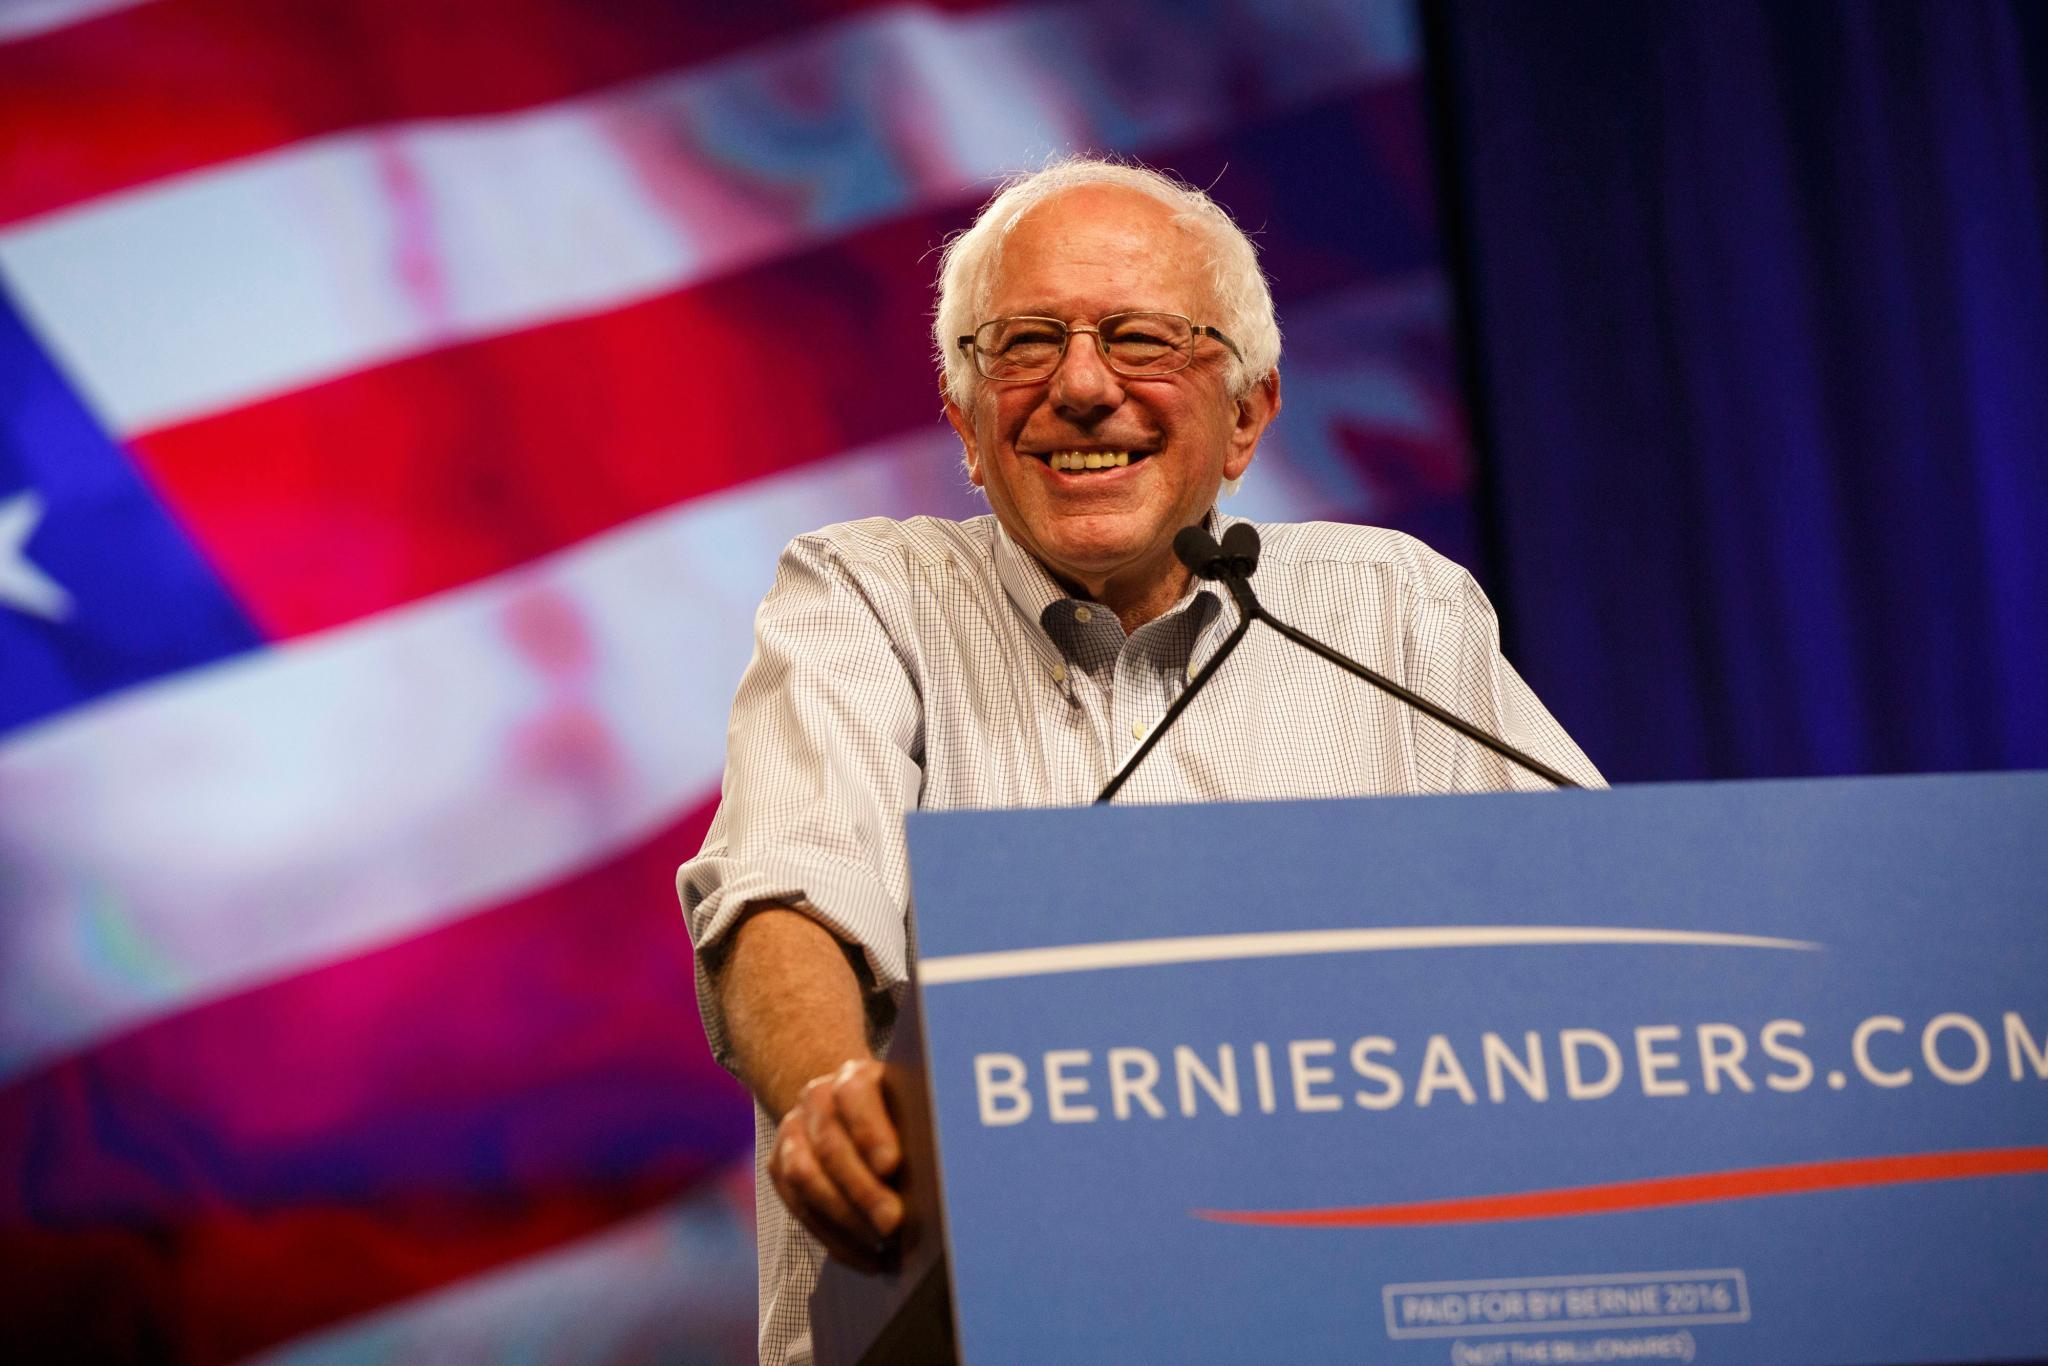 Bernie Sanders' New Plan Will Cancel All Student Loan Debt